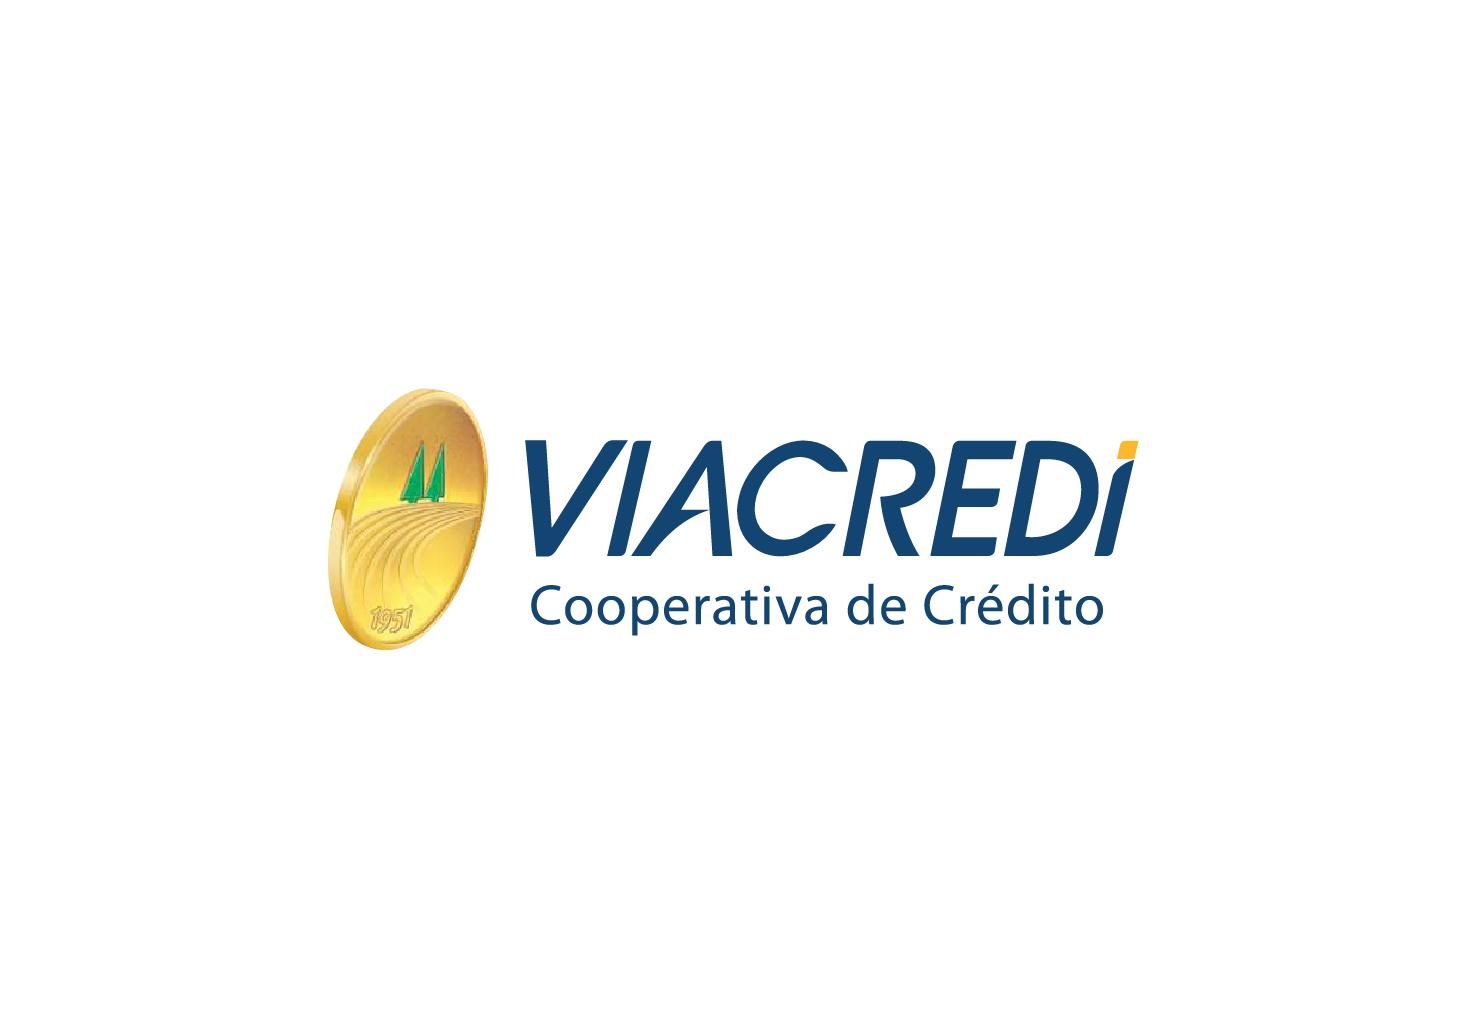 Logotipo AABB Viacredi Cooperativa de Crédito